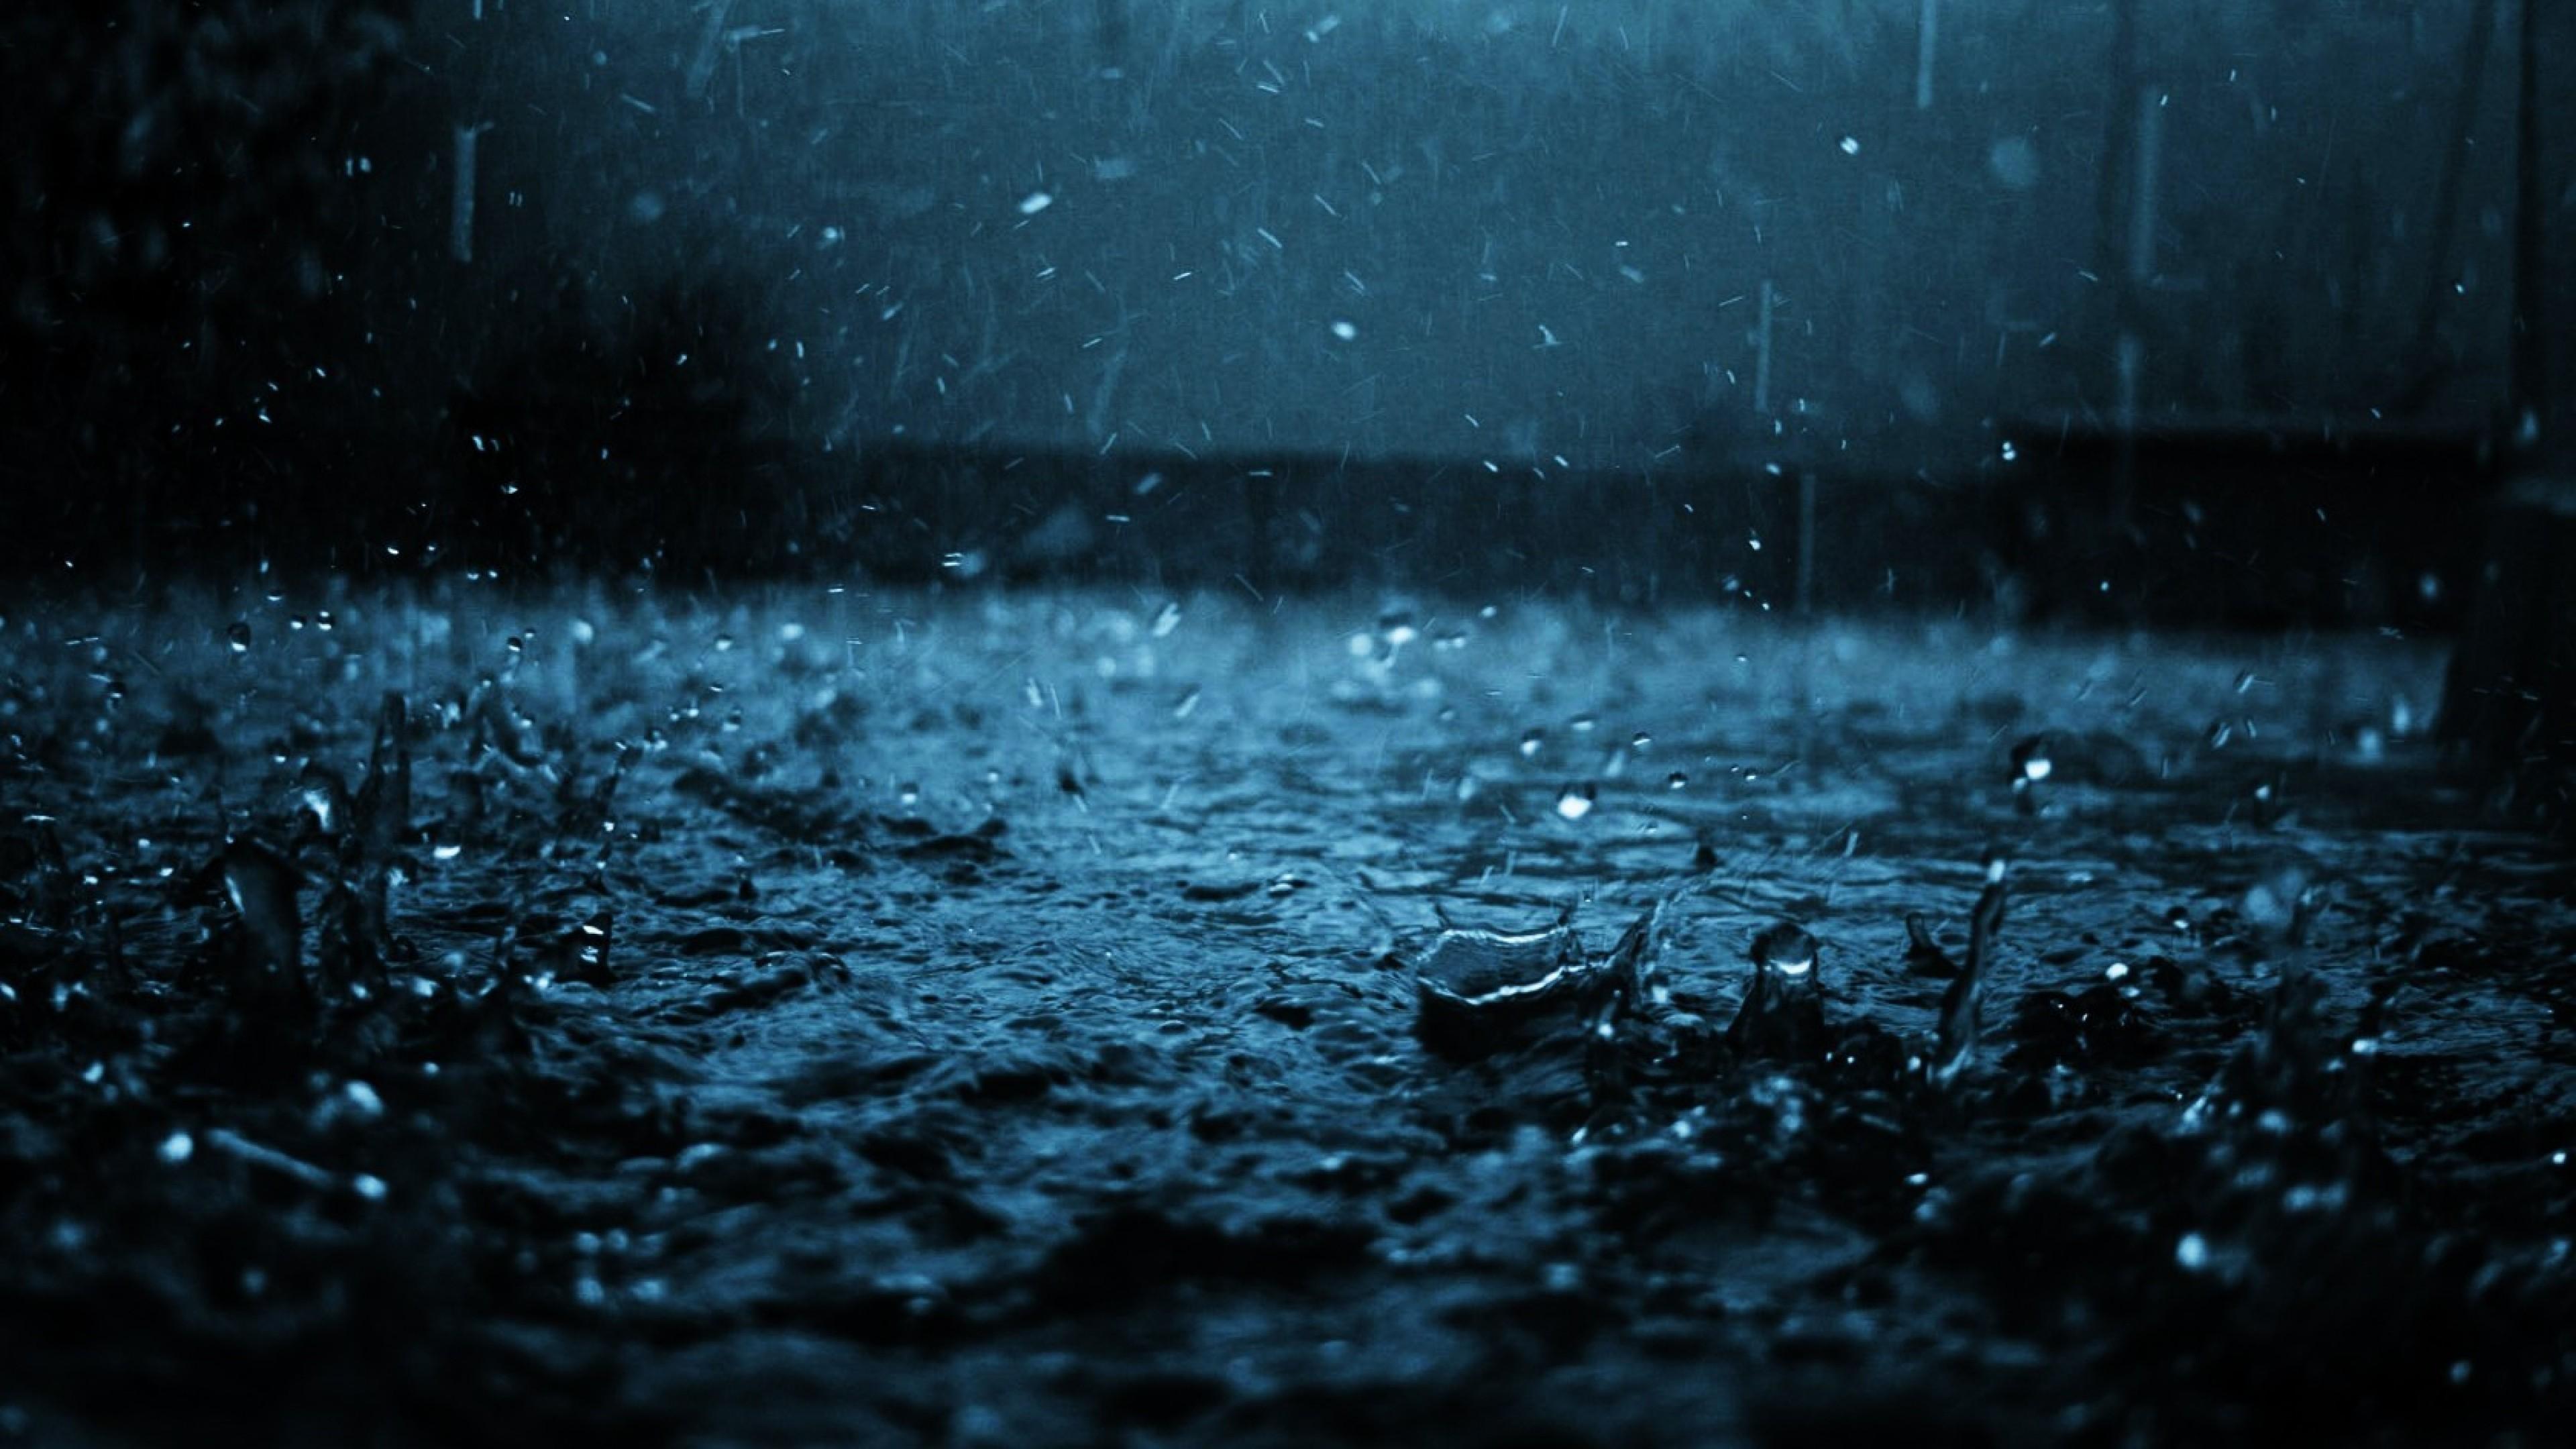 Raining Desktop Background 183 ① Wallpapertag